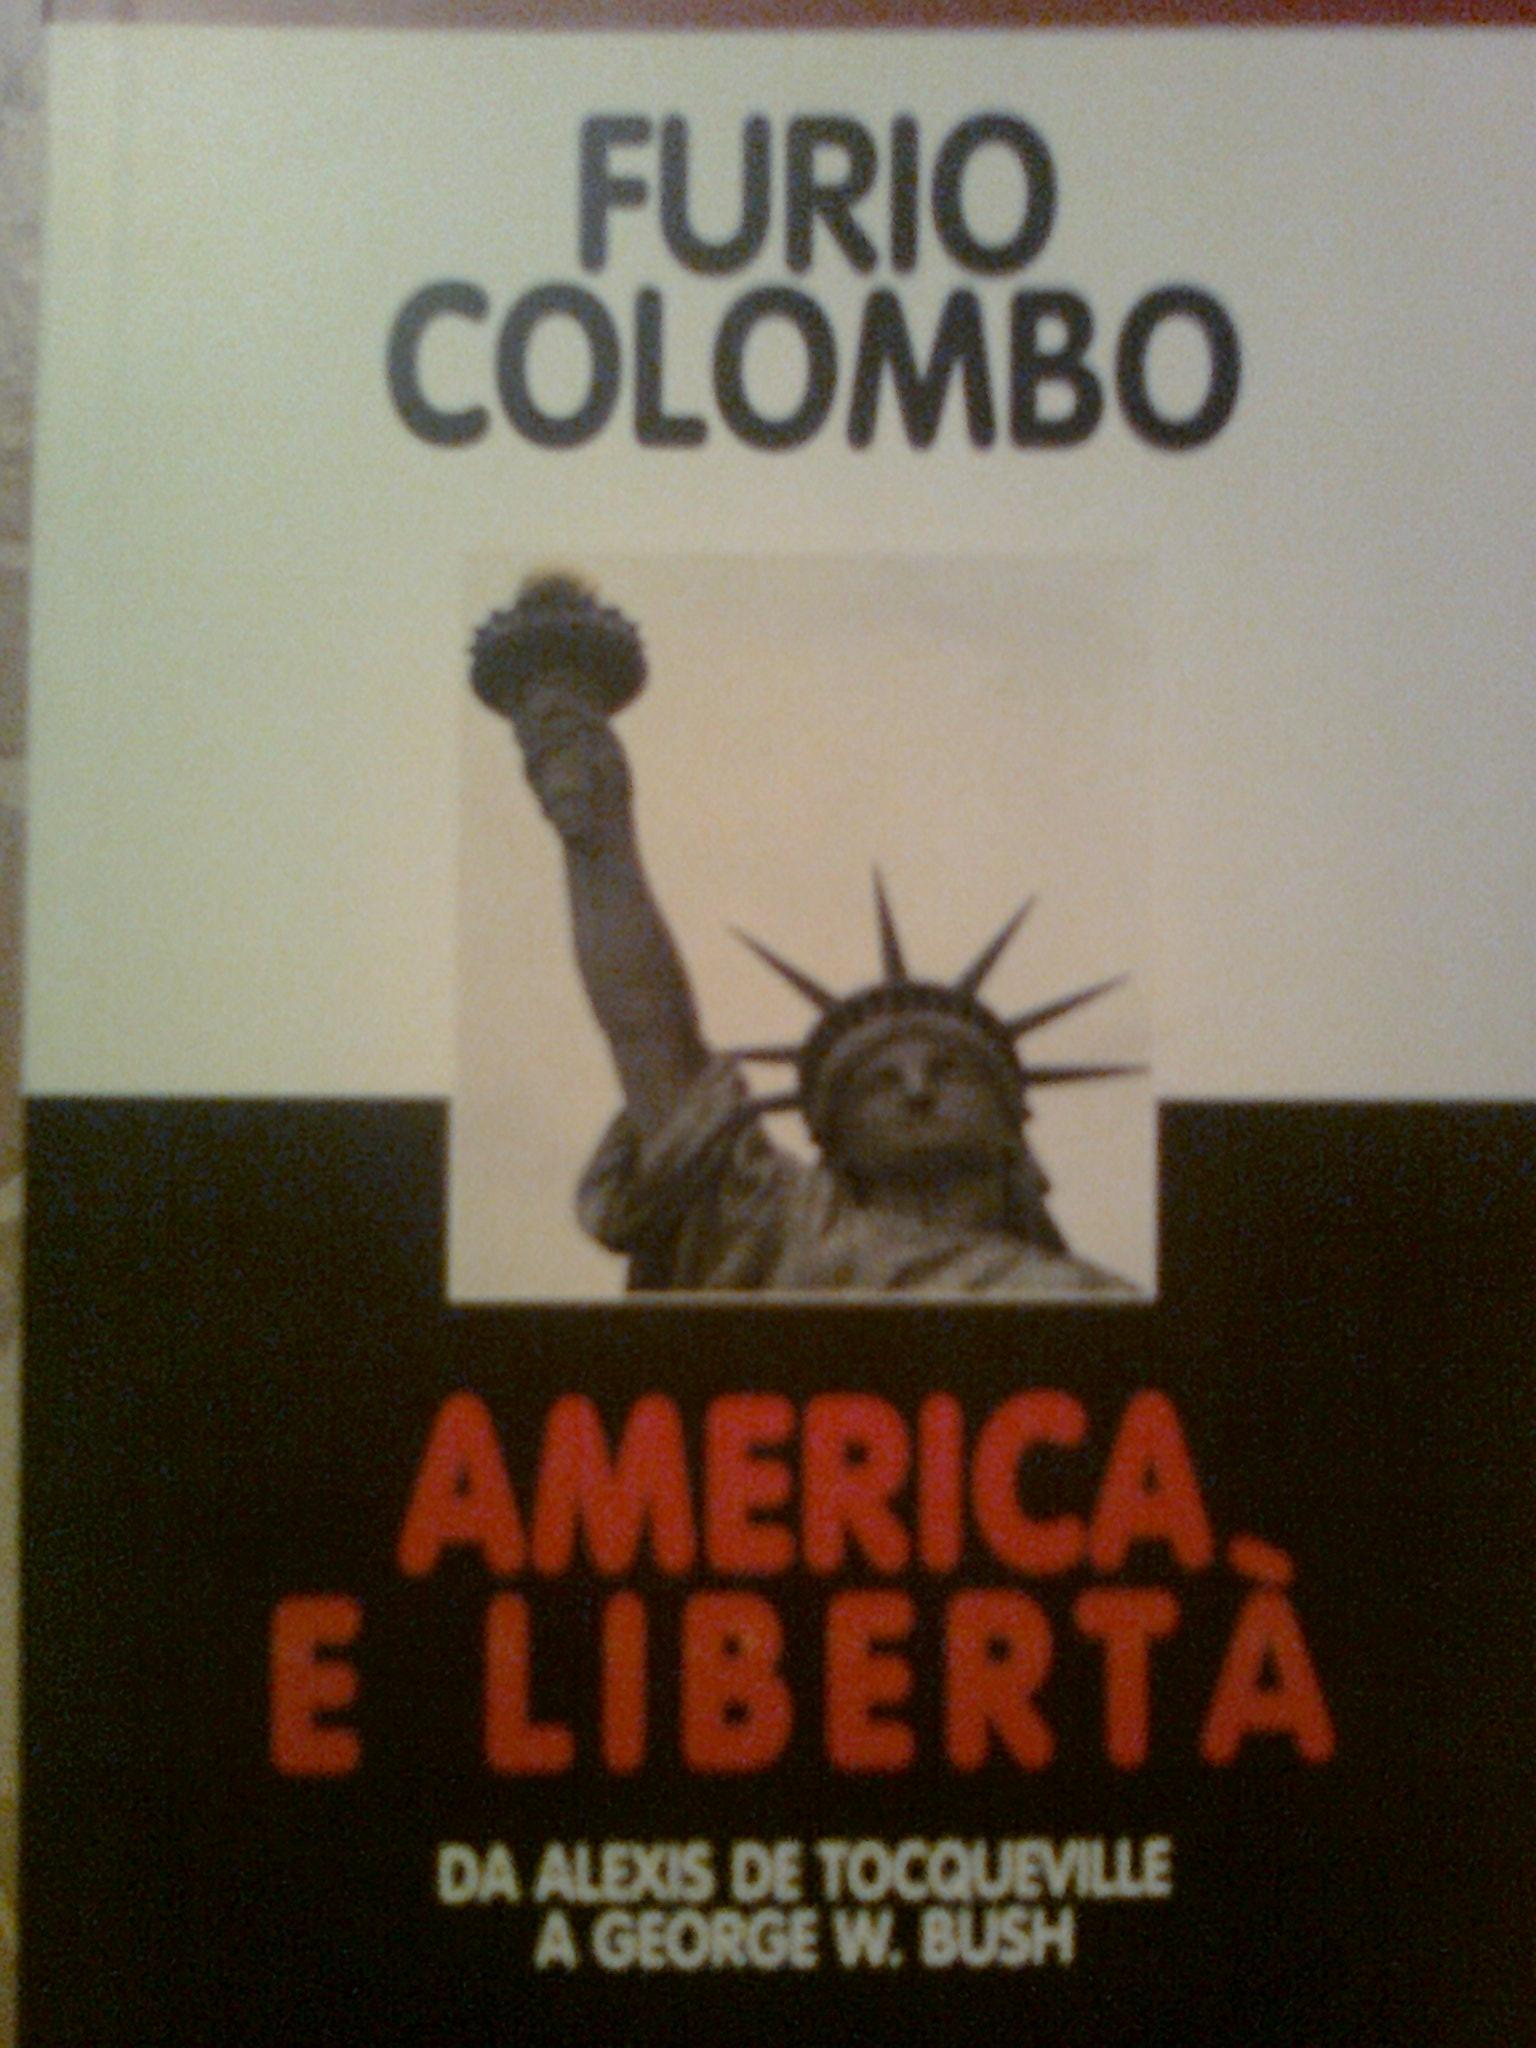 America e libertà